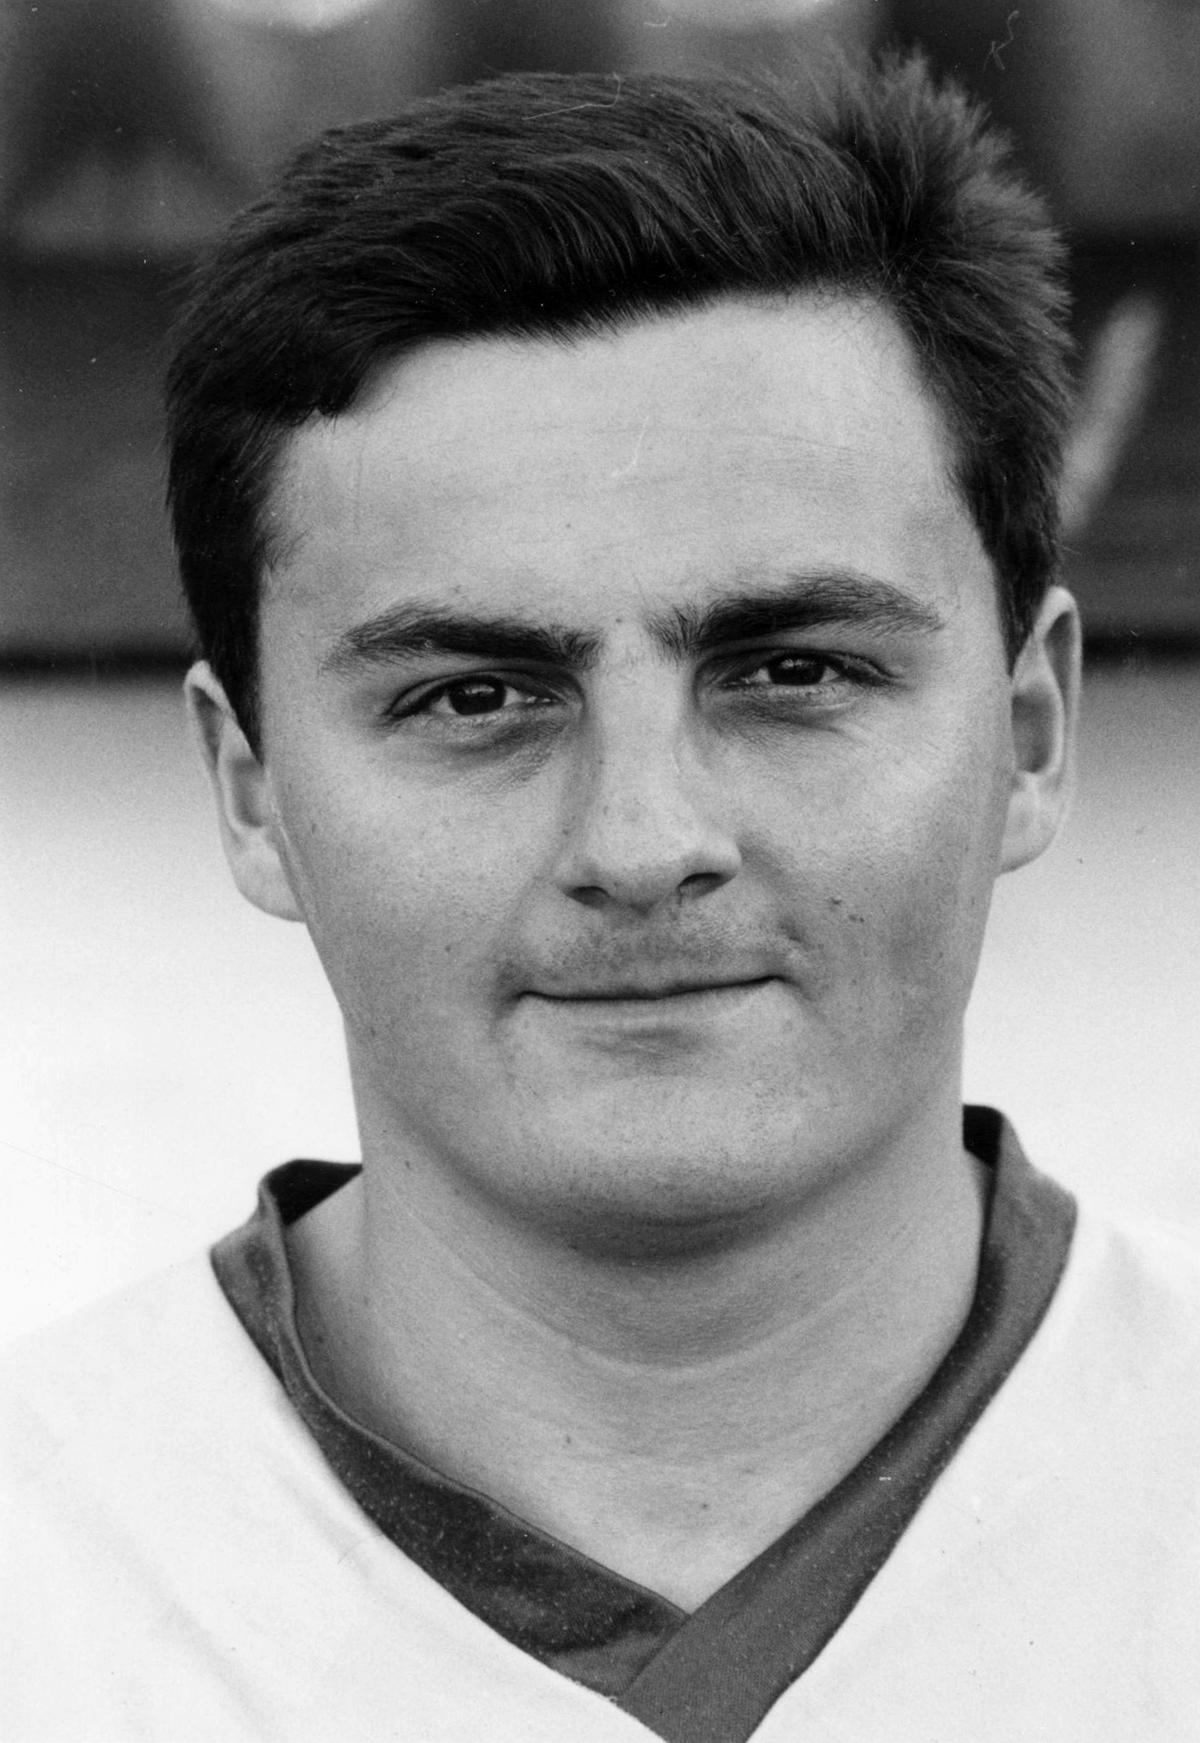 De jonge Rik Masil bij E. Wervik.